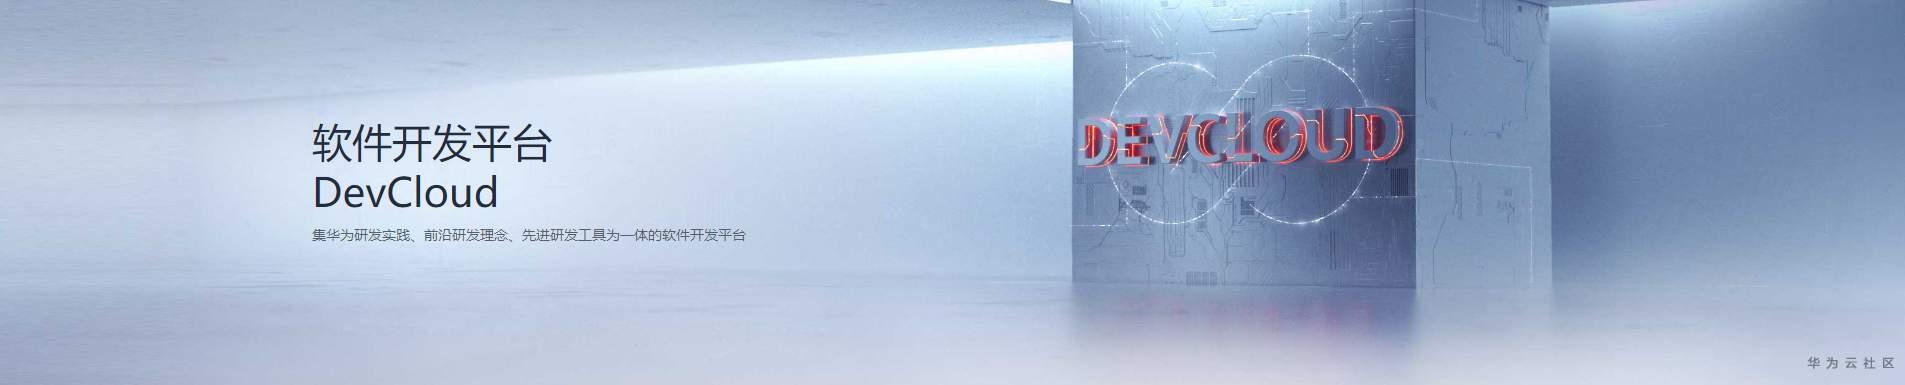 Devcloud.png